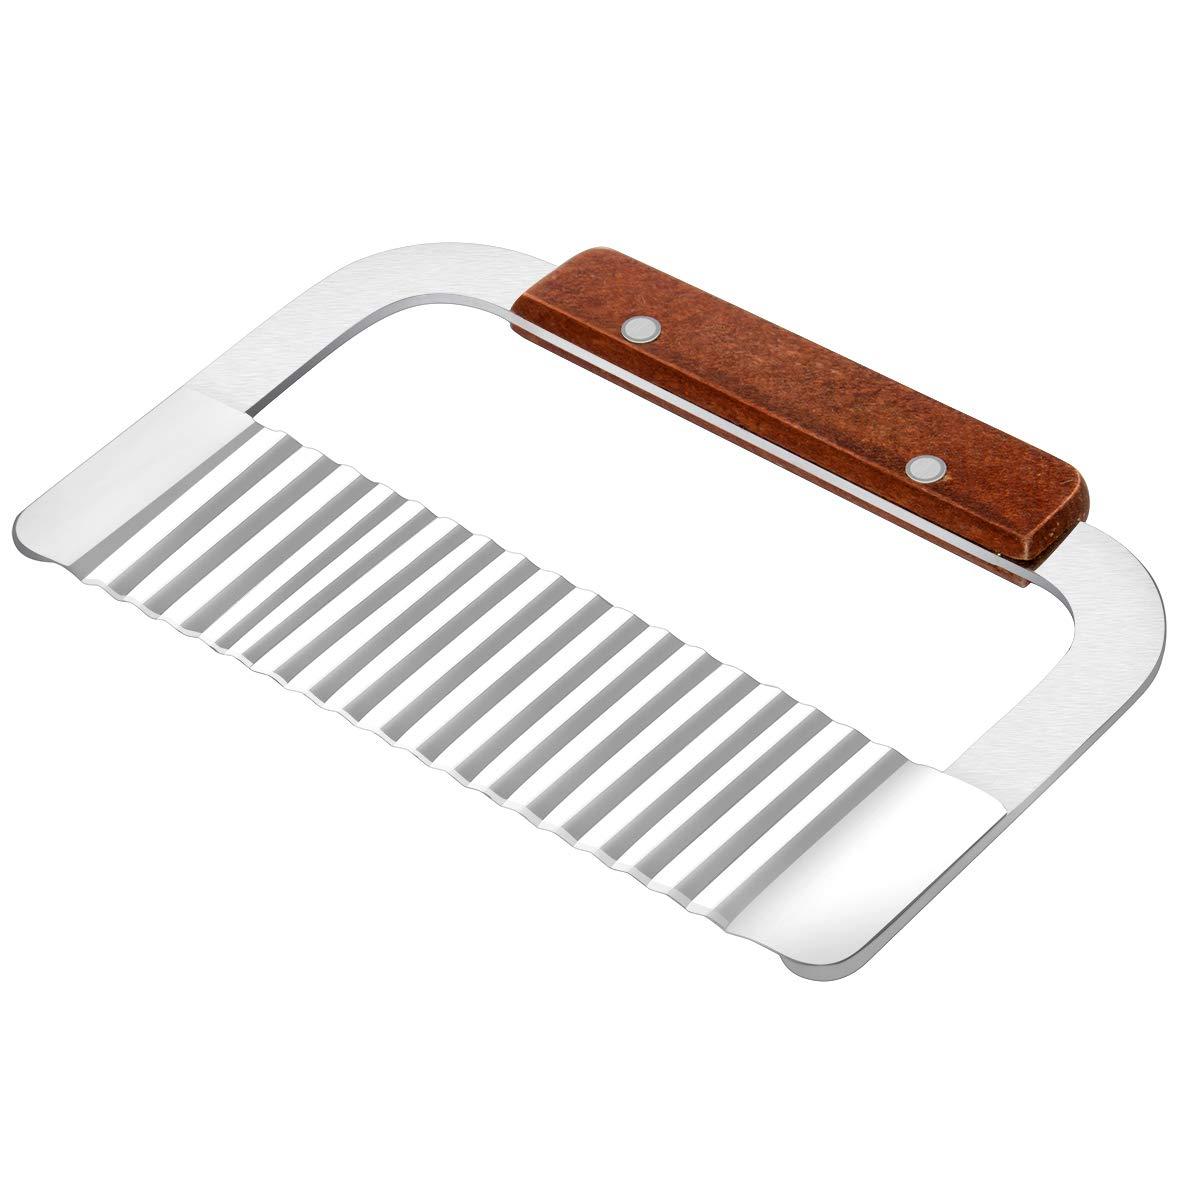 TOP KITCHEN Crinkle Cutter, Wood handle Steel Blade, Wave Crinkle Cut Tool, 7-Inch